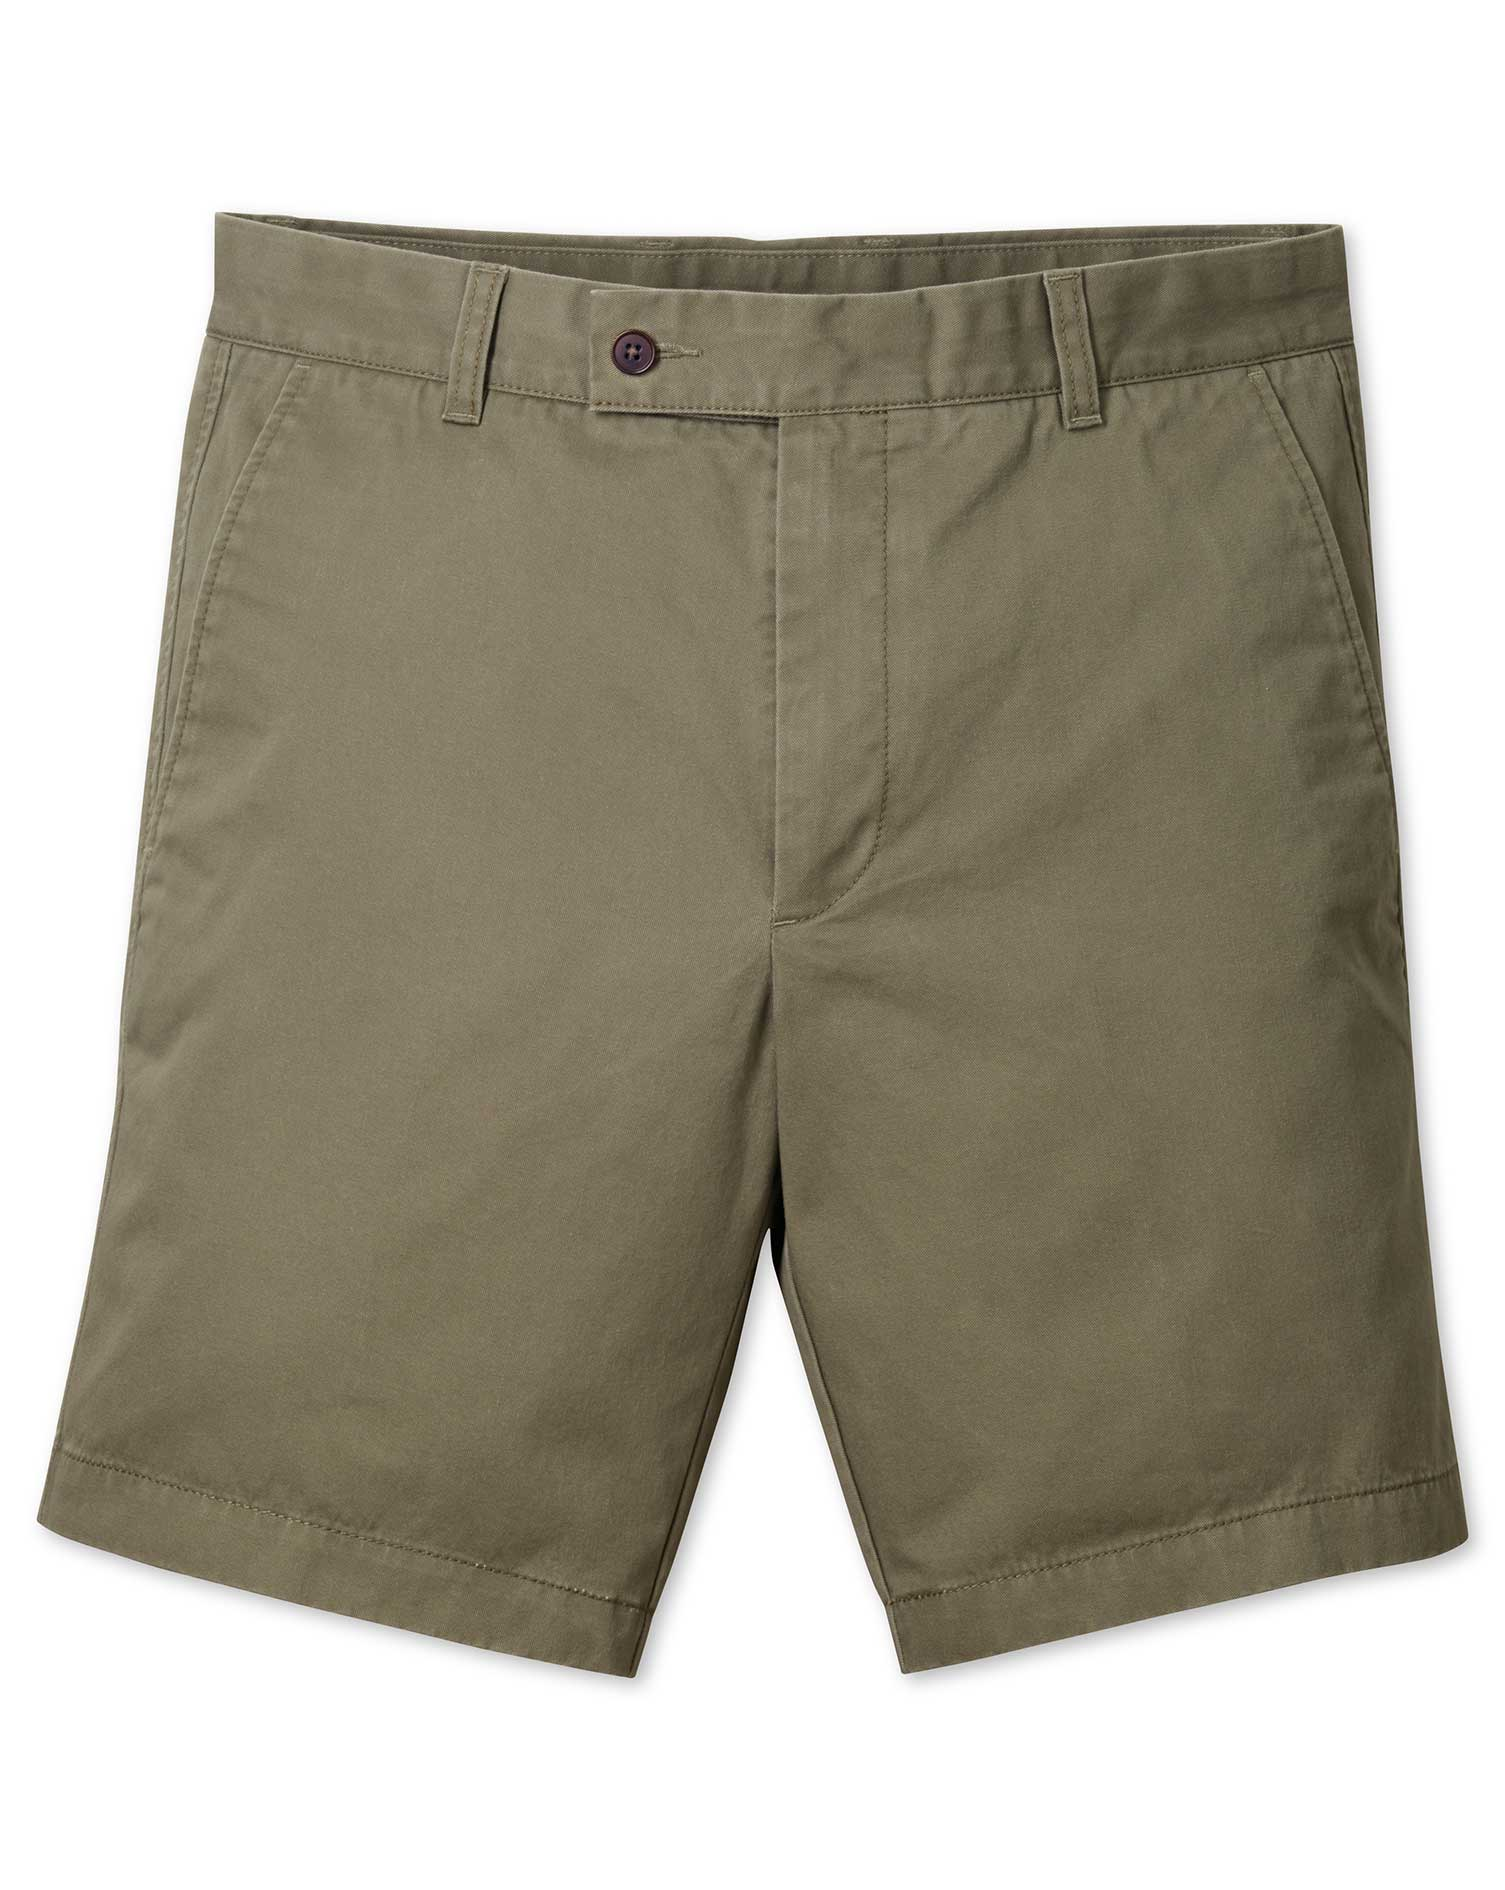 Khaki Chino Cotton Shorts Size 36 by Charles Tyrwhitt